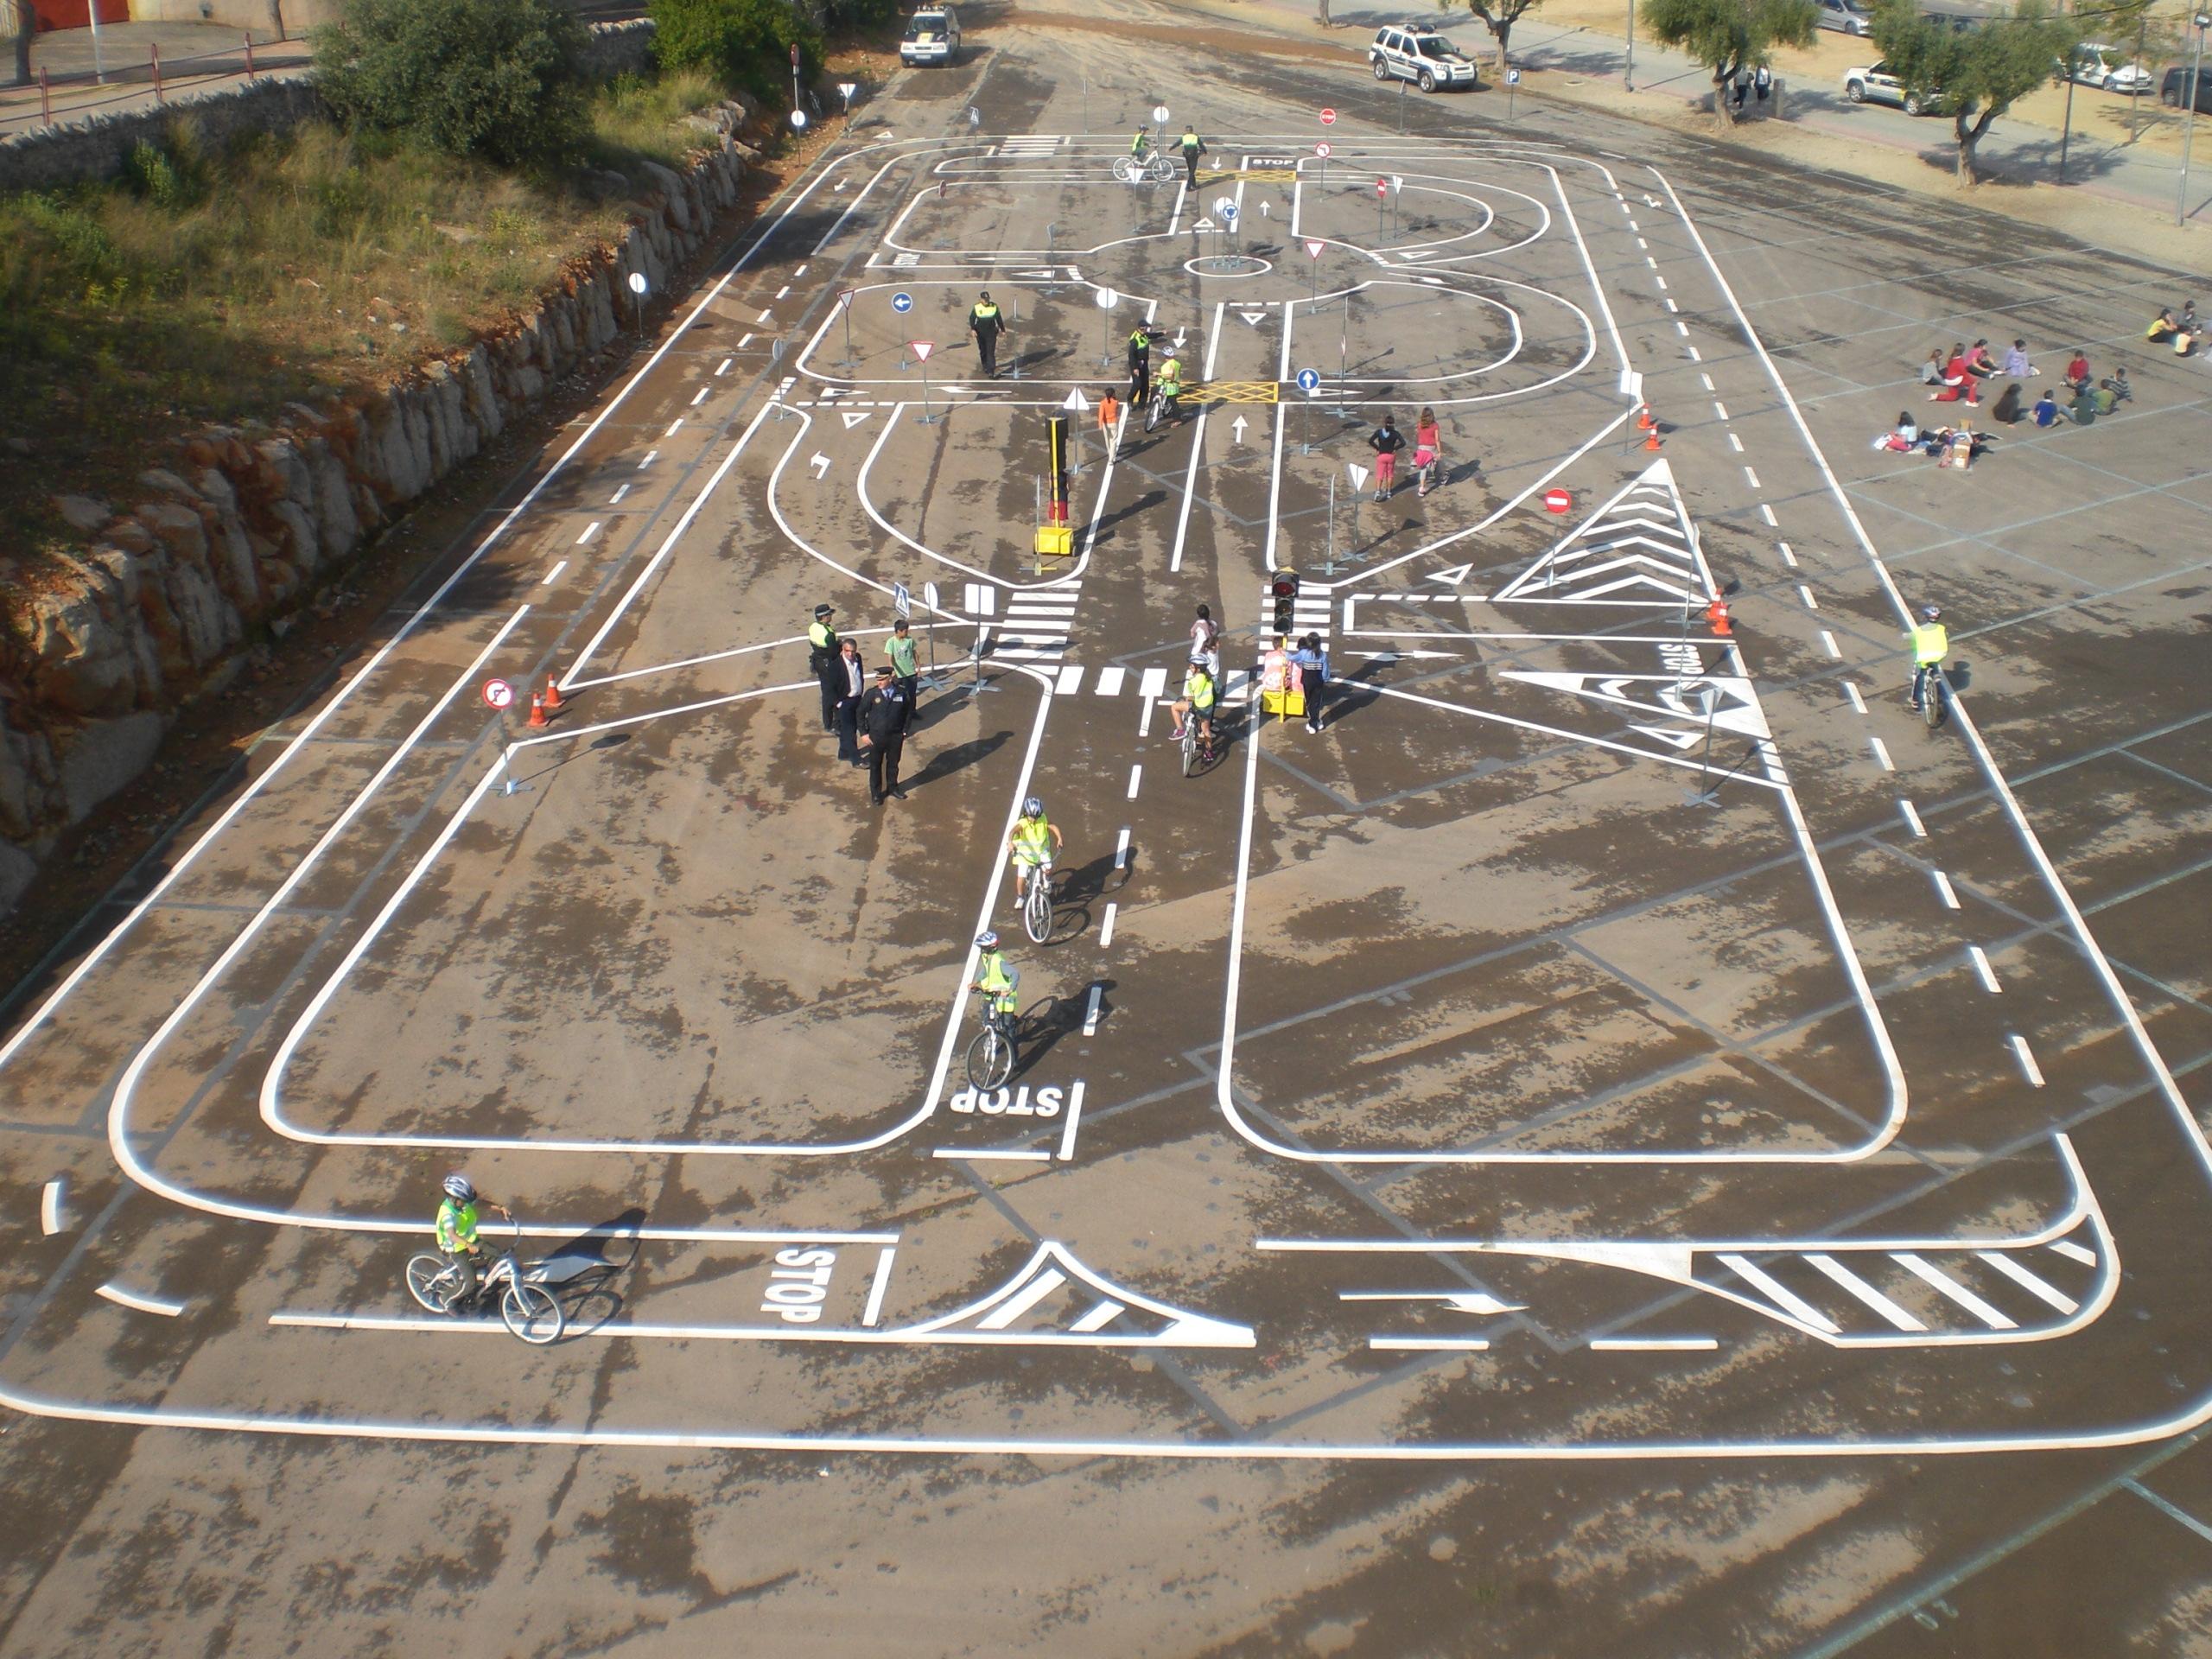 Circuito Vial : Circuito vial infantil educación